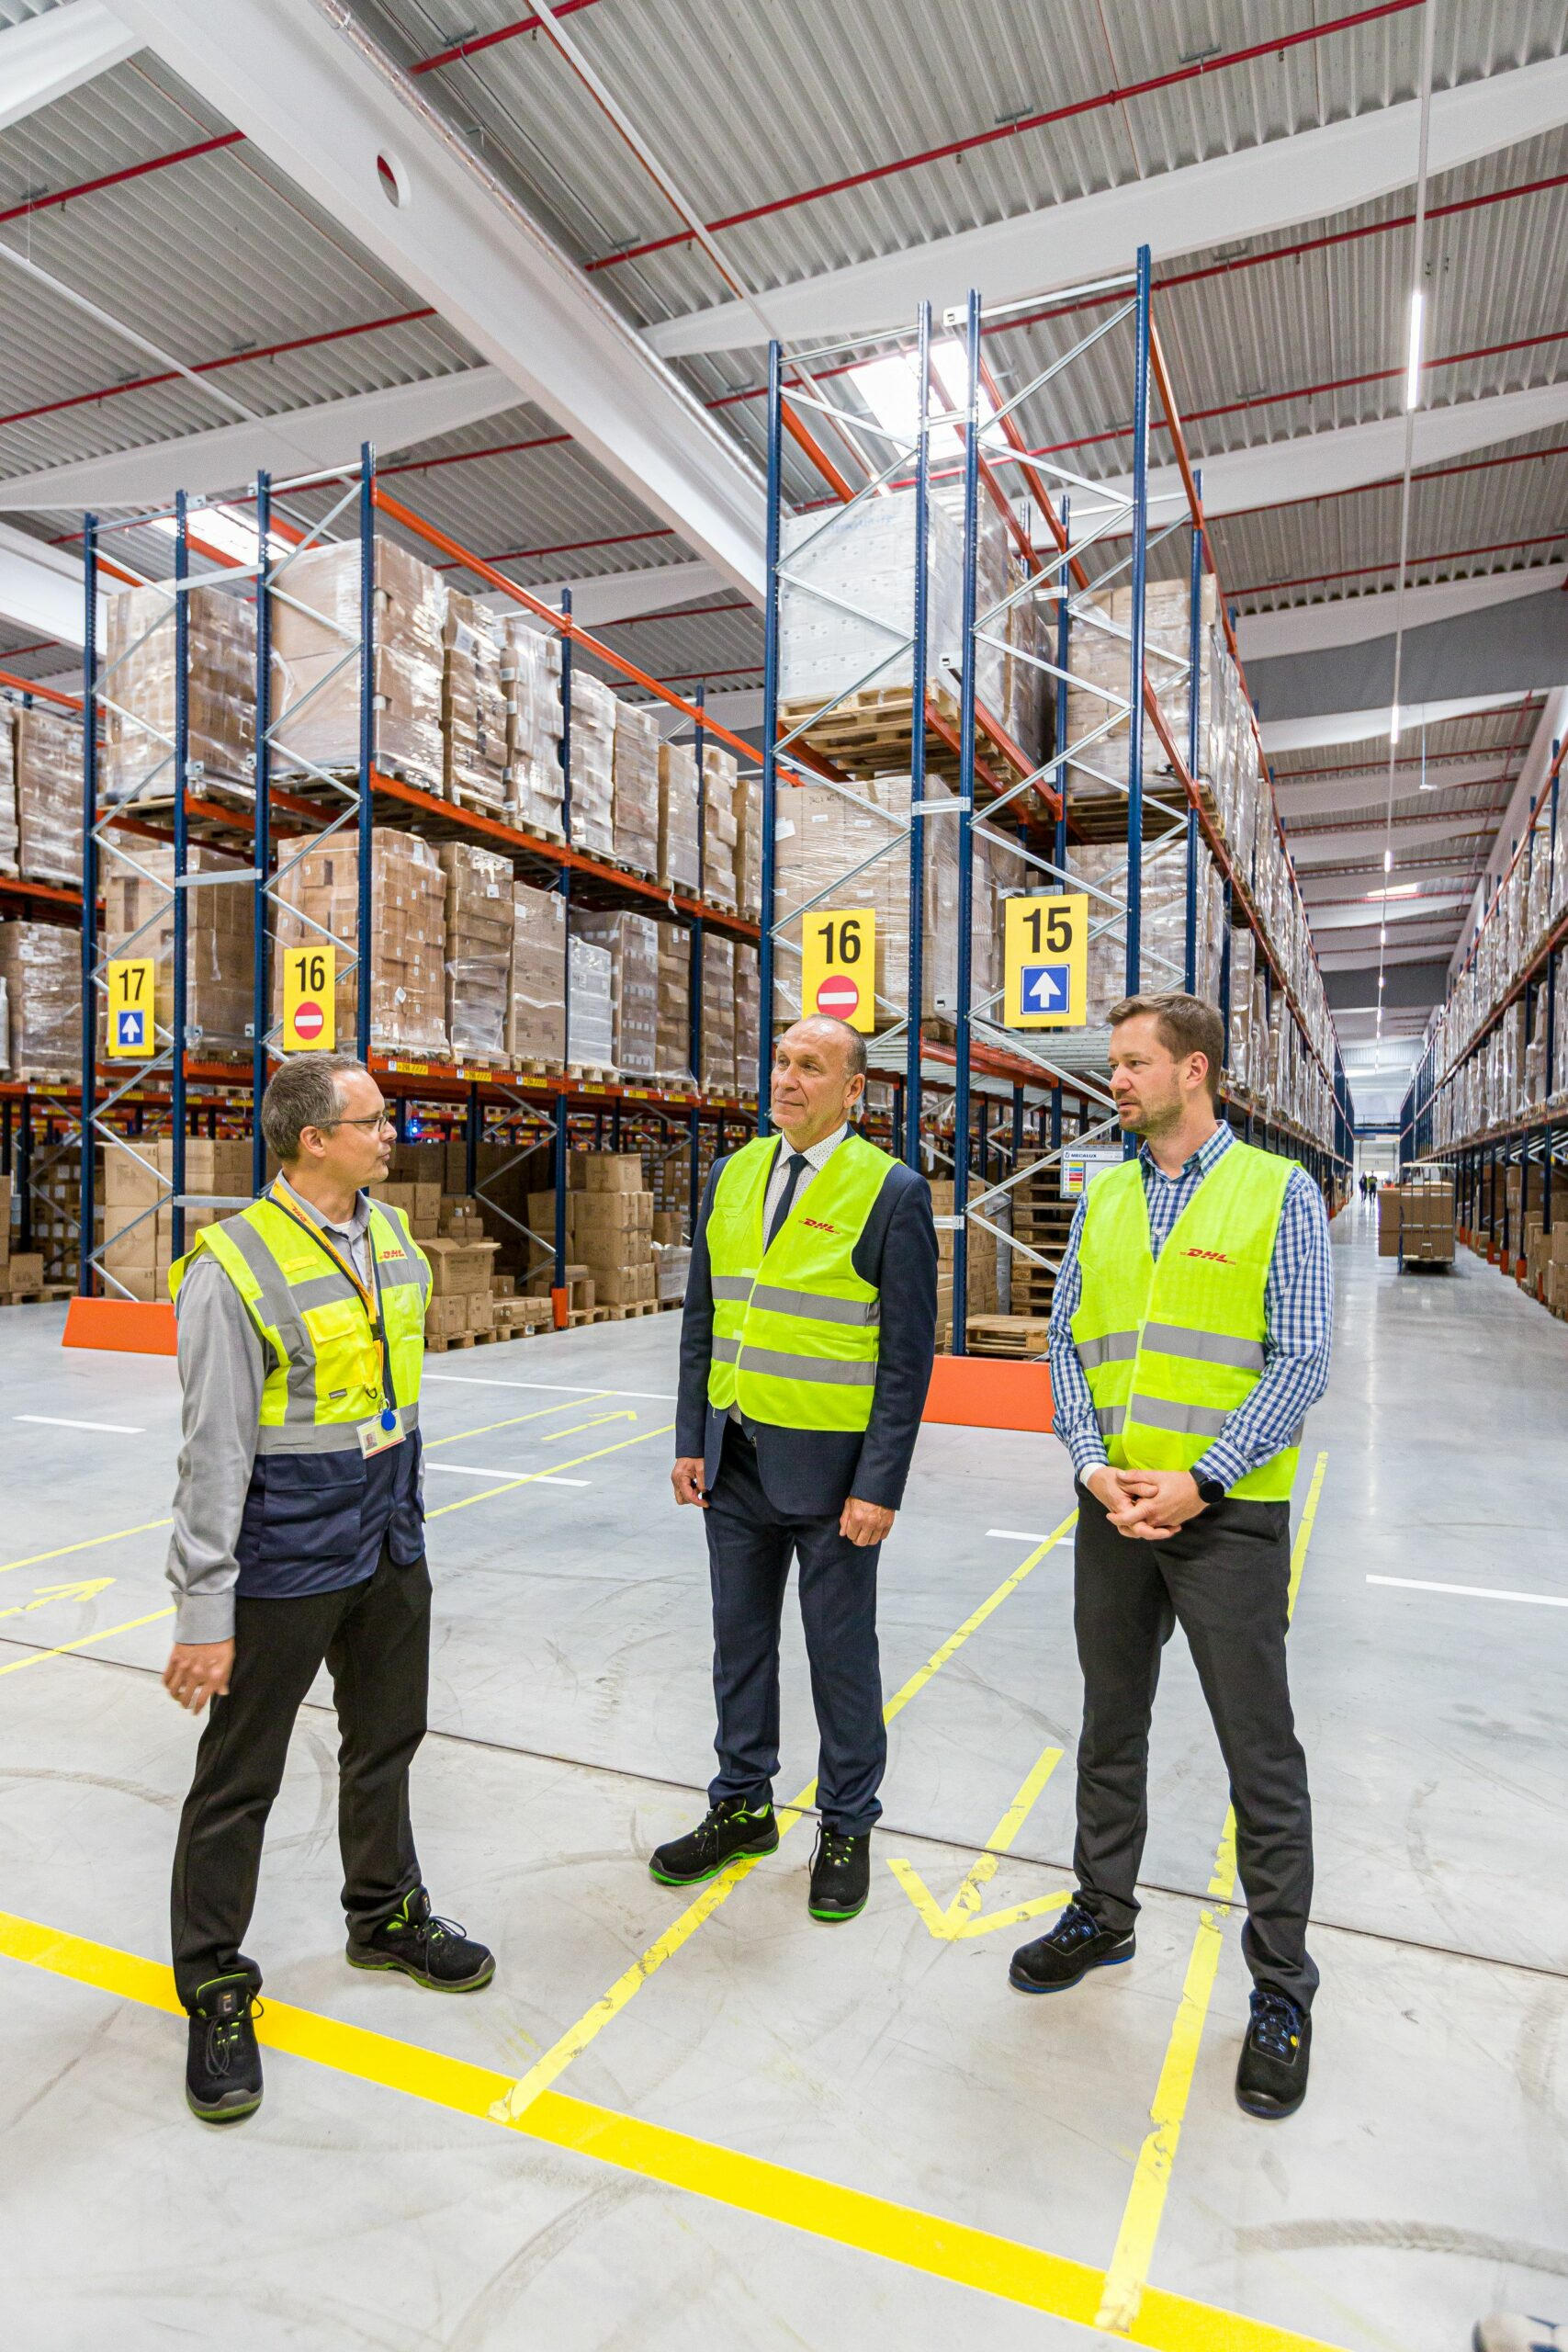 otvorenie distribucneho centra sklad bratislava logistika oficialne otvorenie gala eventova agentura